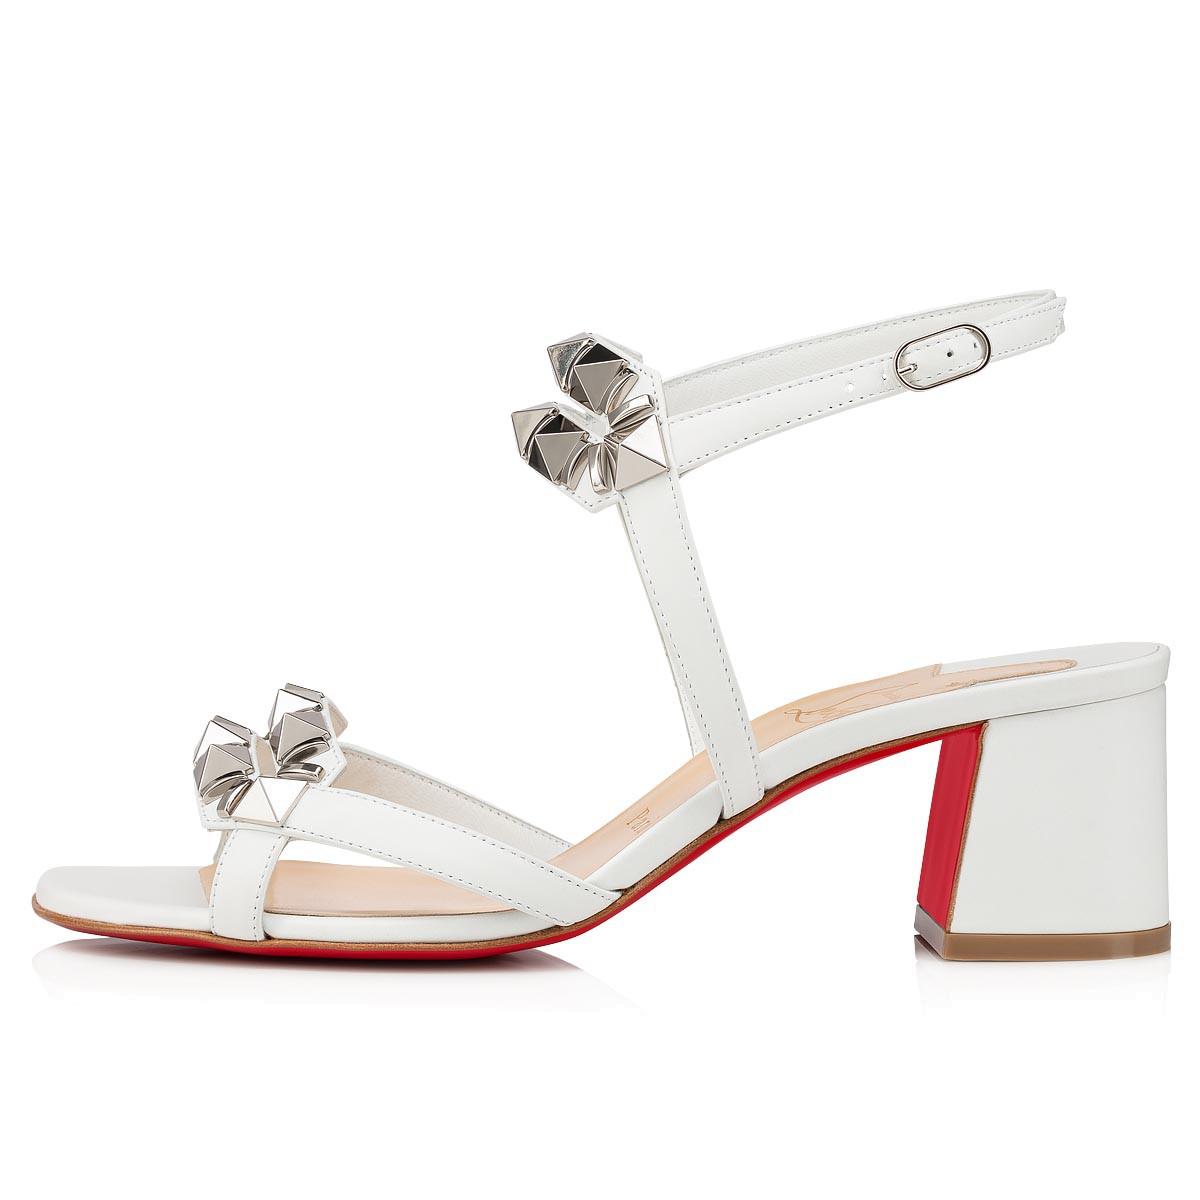 Shoes - Galerietta - Christian Louboutin